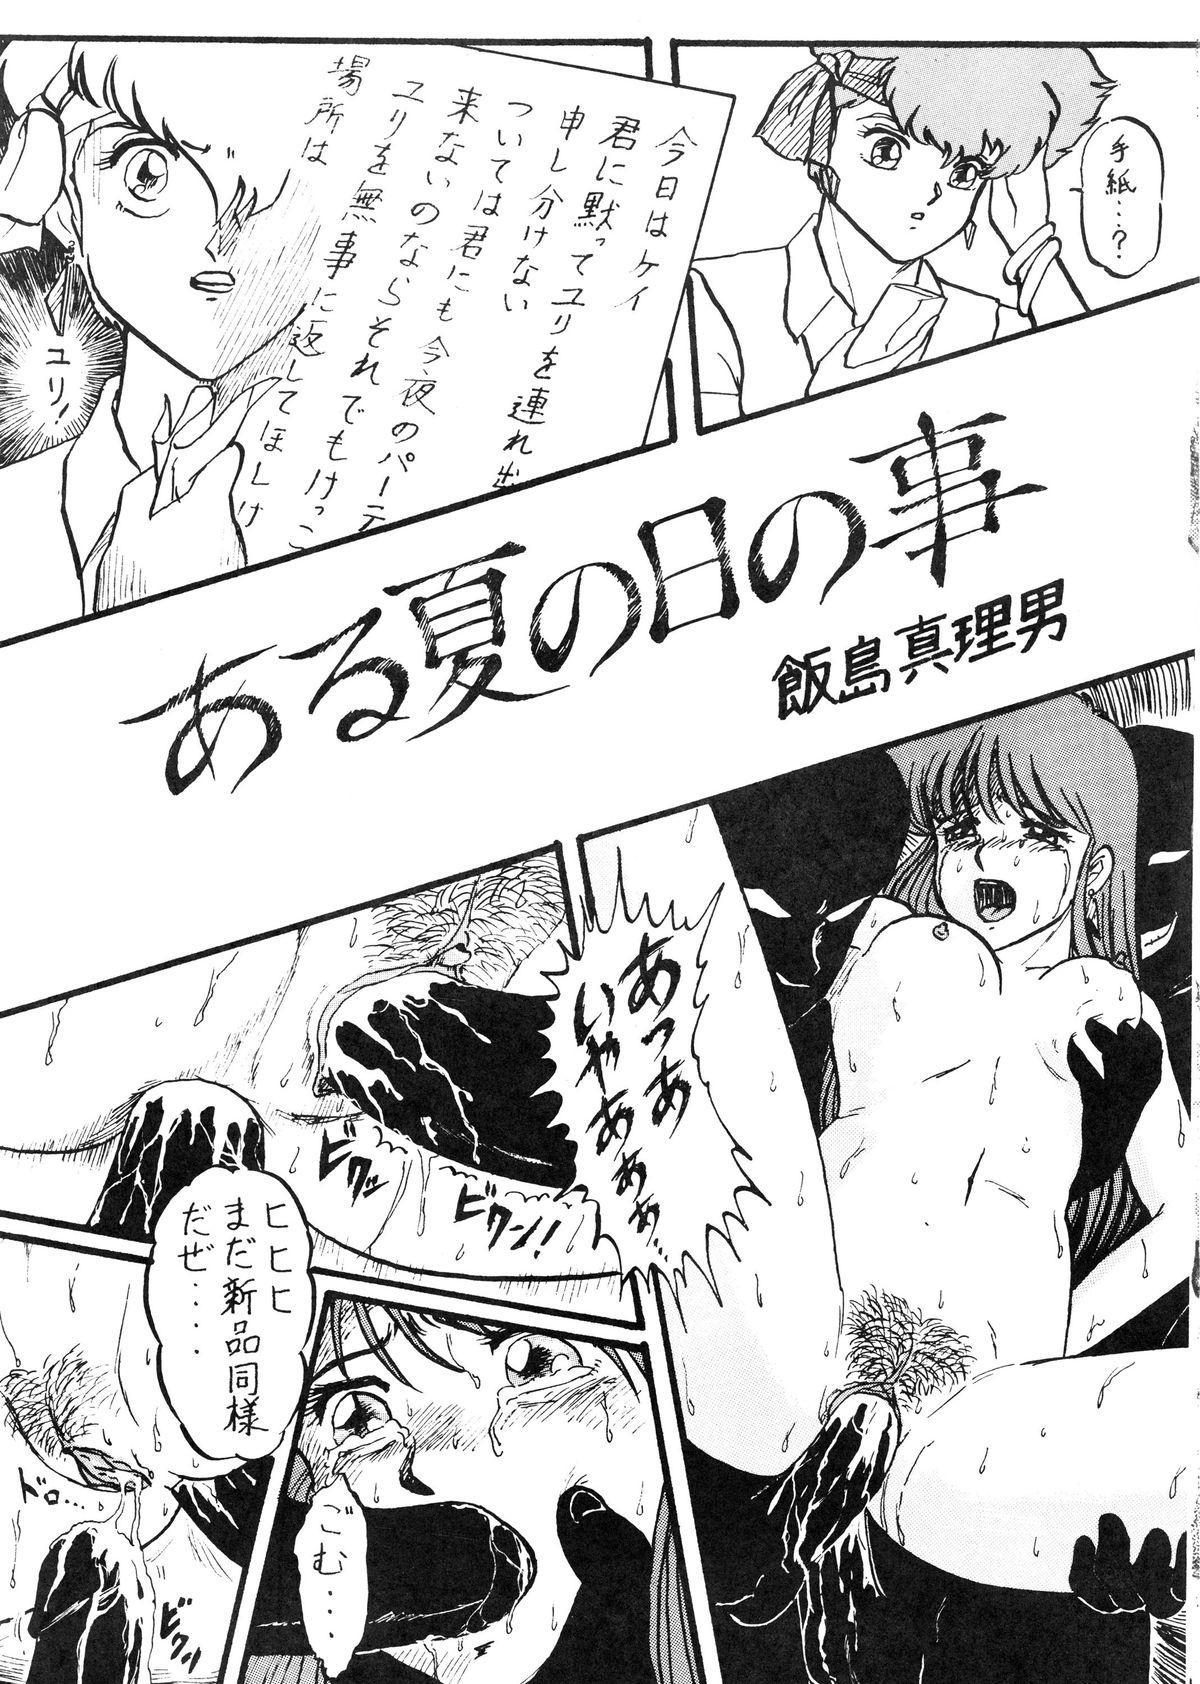 [Secret Society Chi (Iijima Mario)] Kai II - Iijima Mario Kojin-shi - (Various) 31